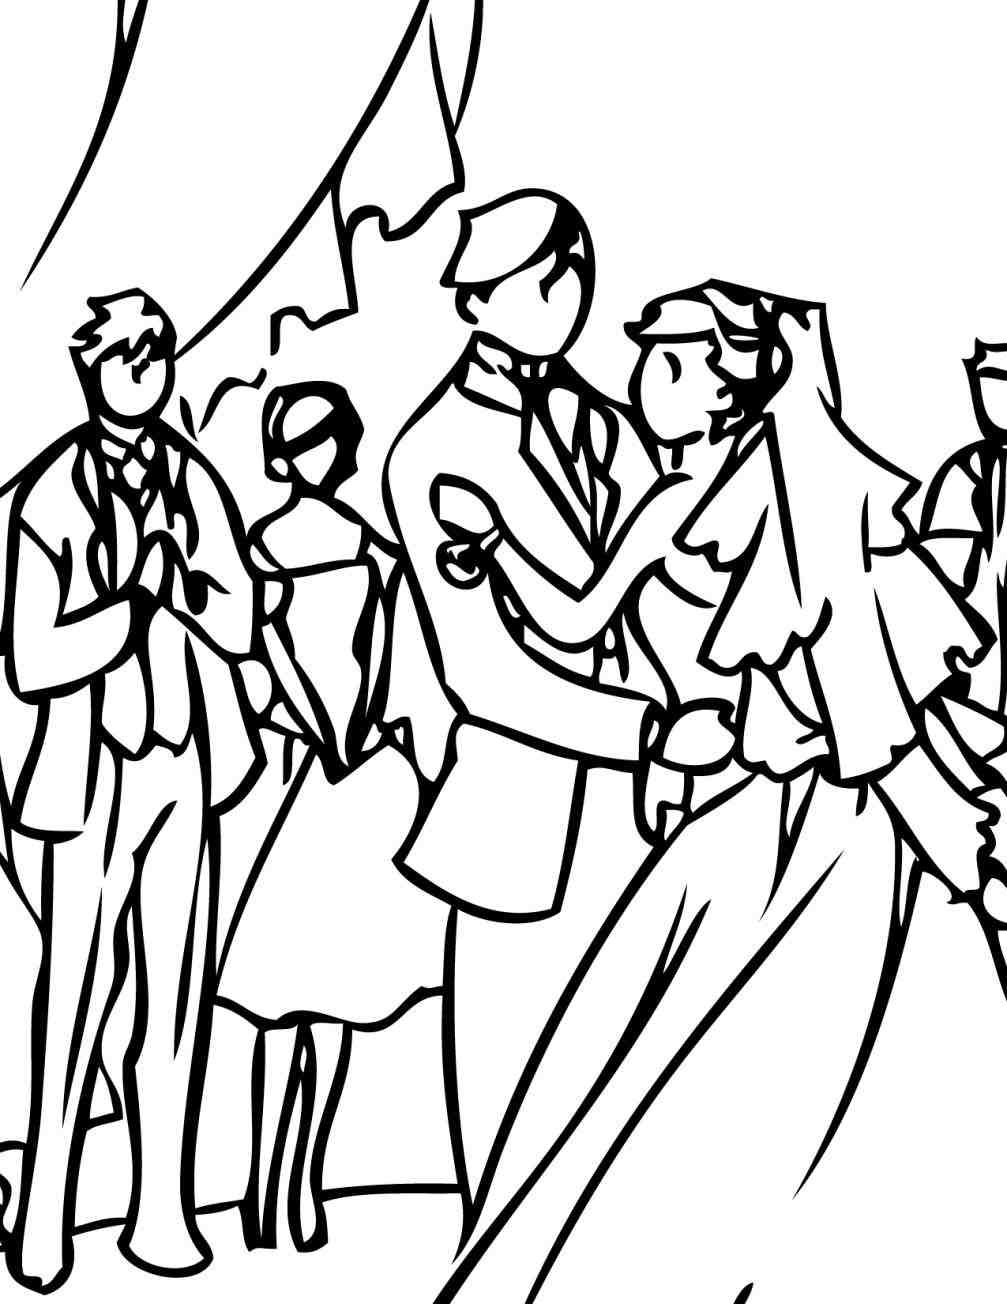 Wedding banquet clipart clip transparent stock Reception Clipart | Free download best Reception Clipart on ... clip transparent stock